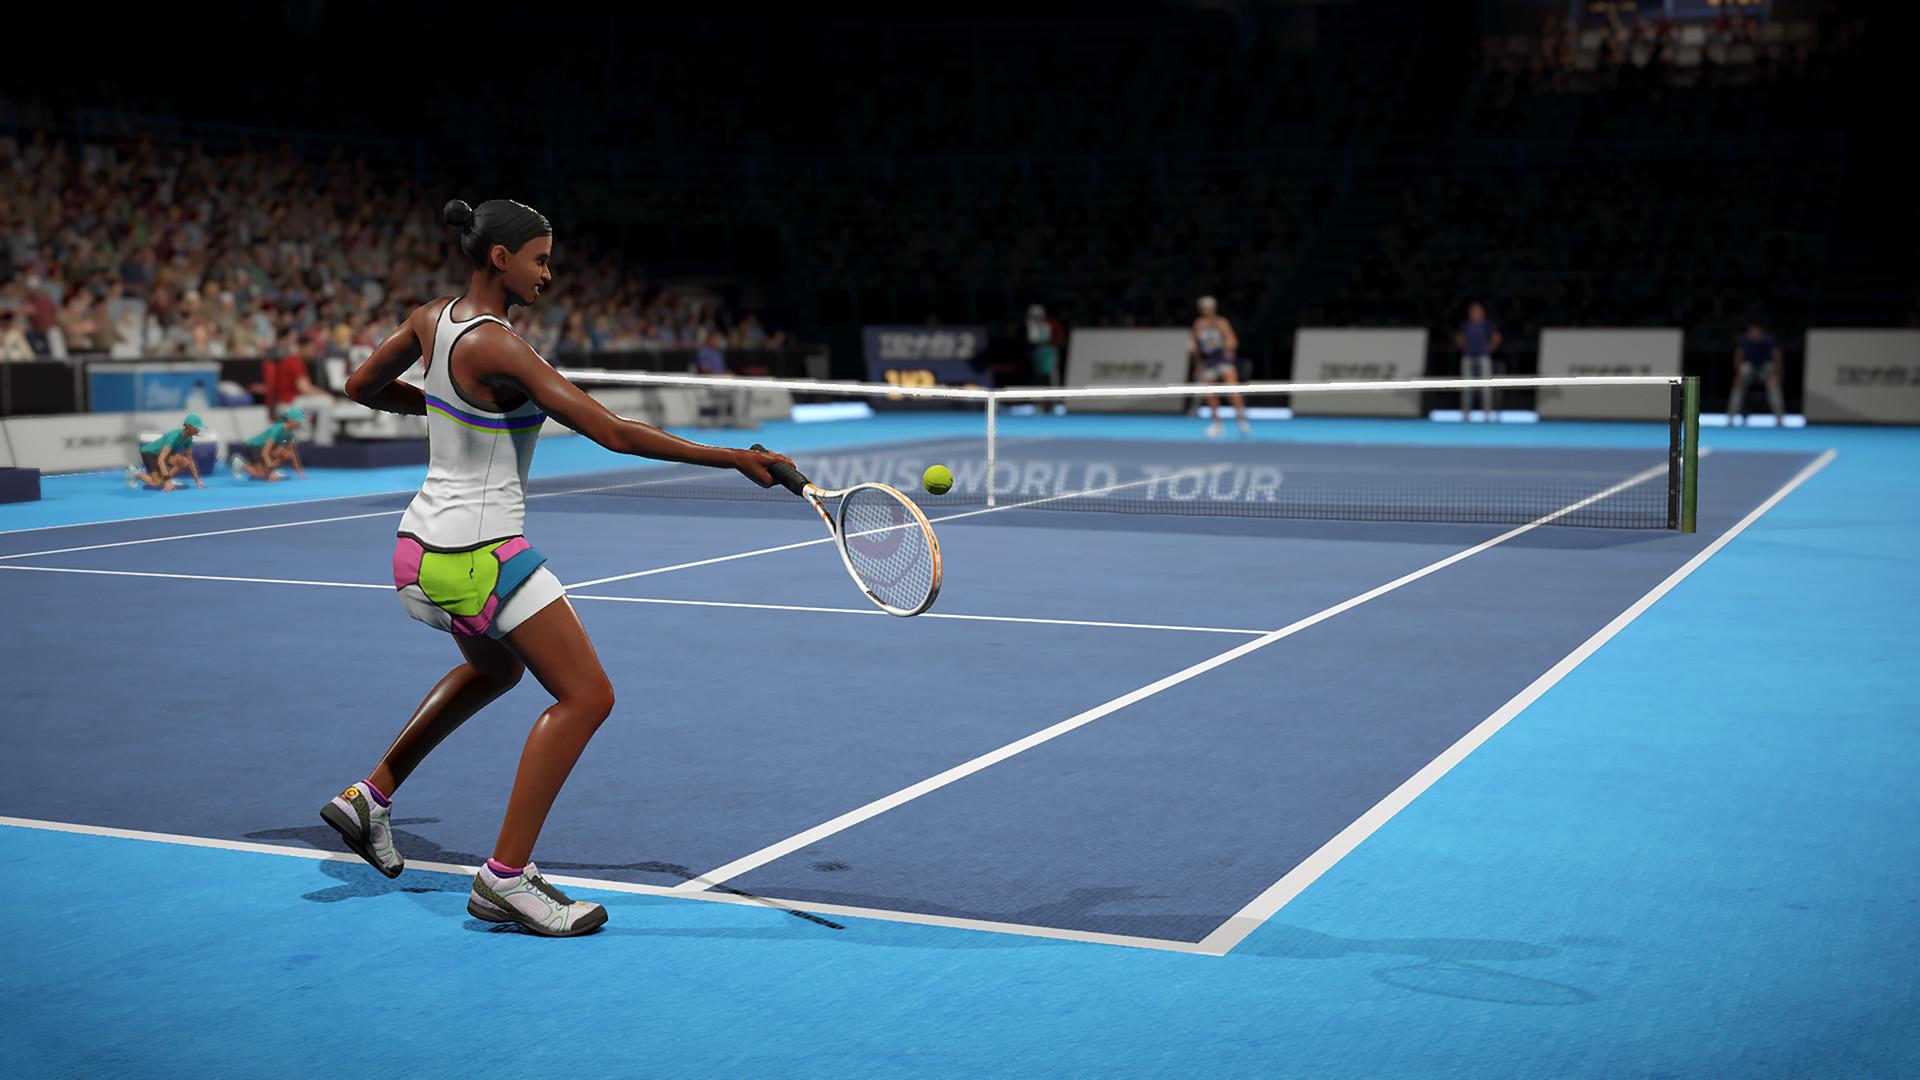 tennis-world-tour-2-pc-screenshot-03